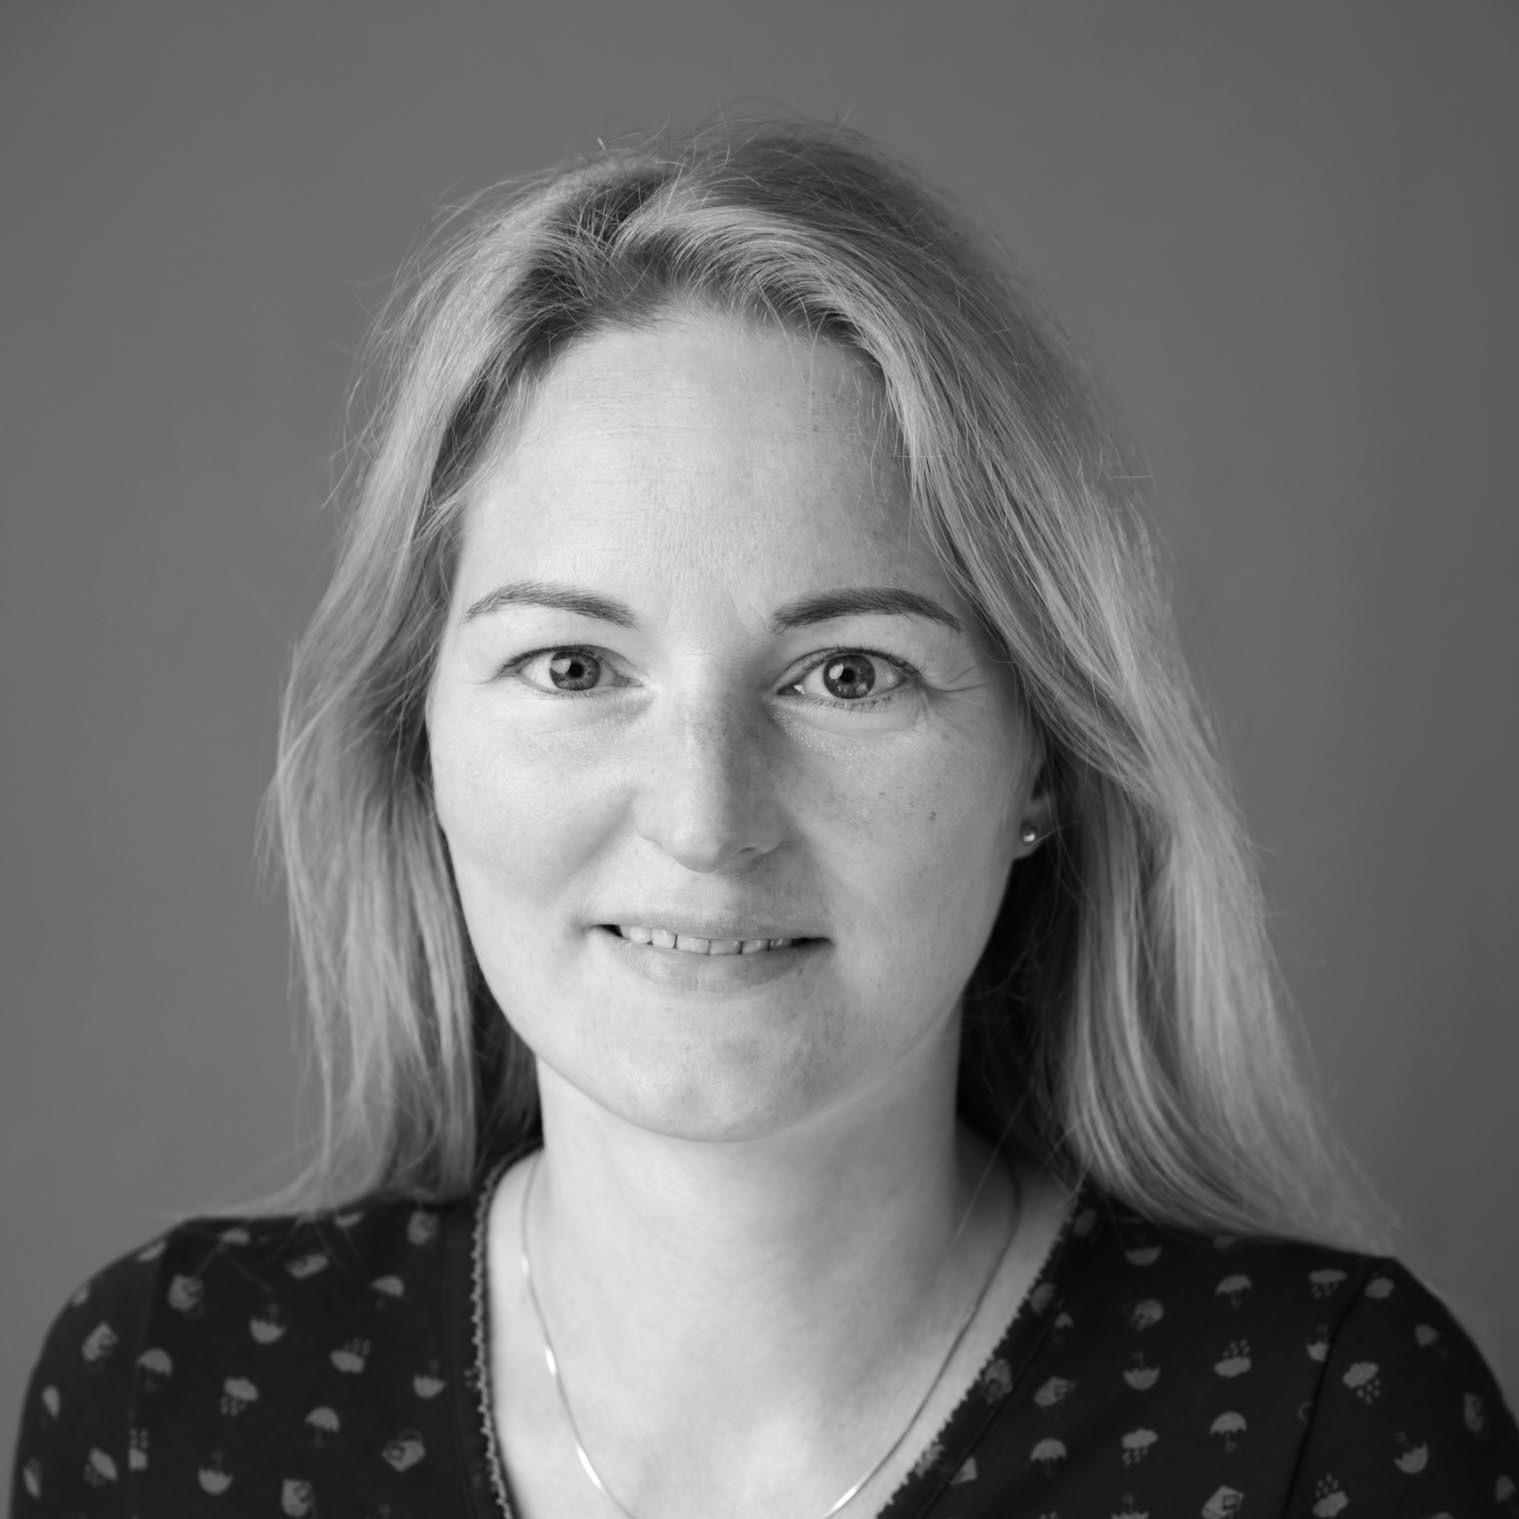 Rechtsanwältin  Monique Bocklage